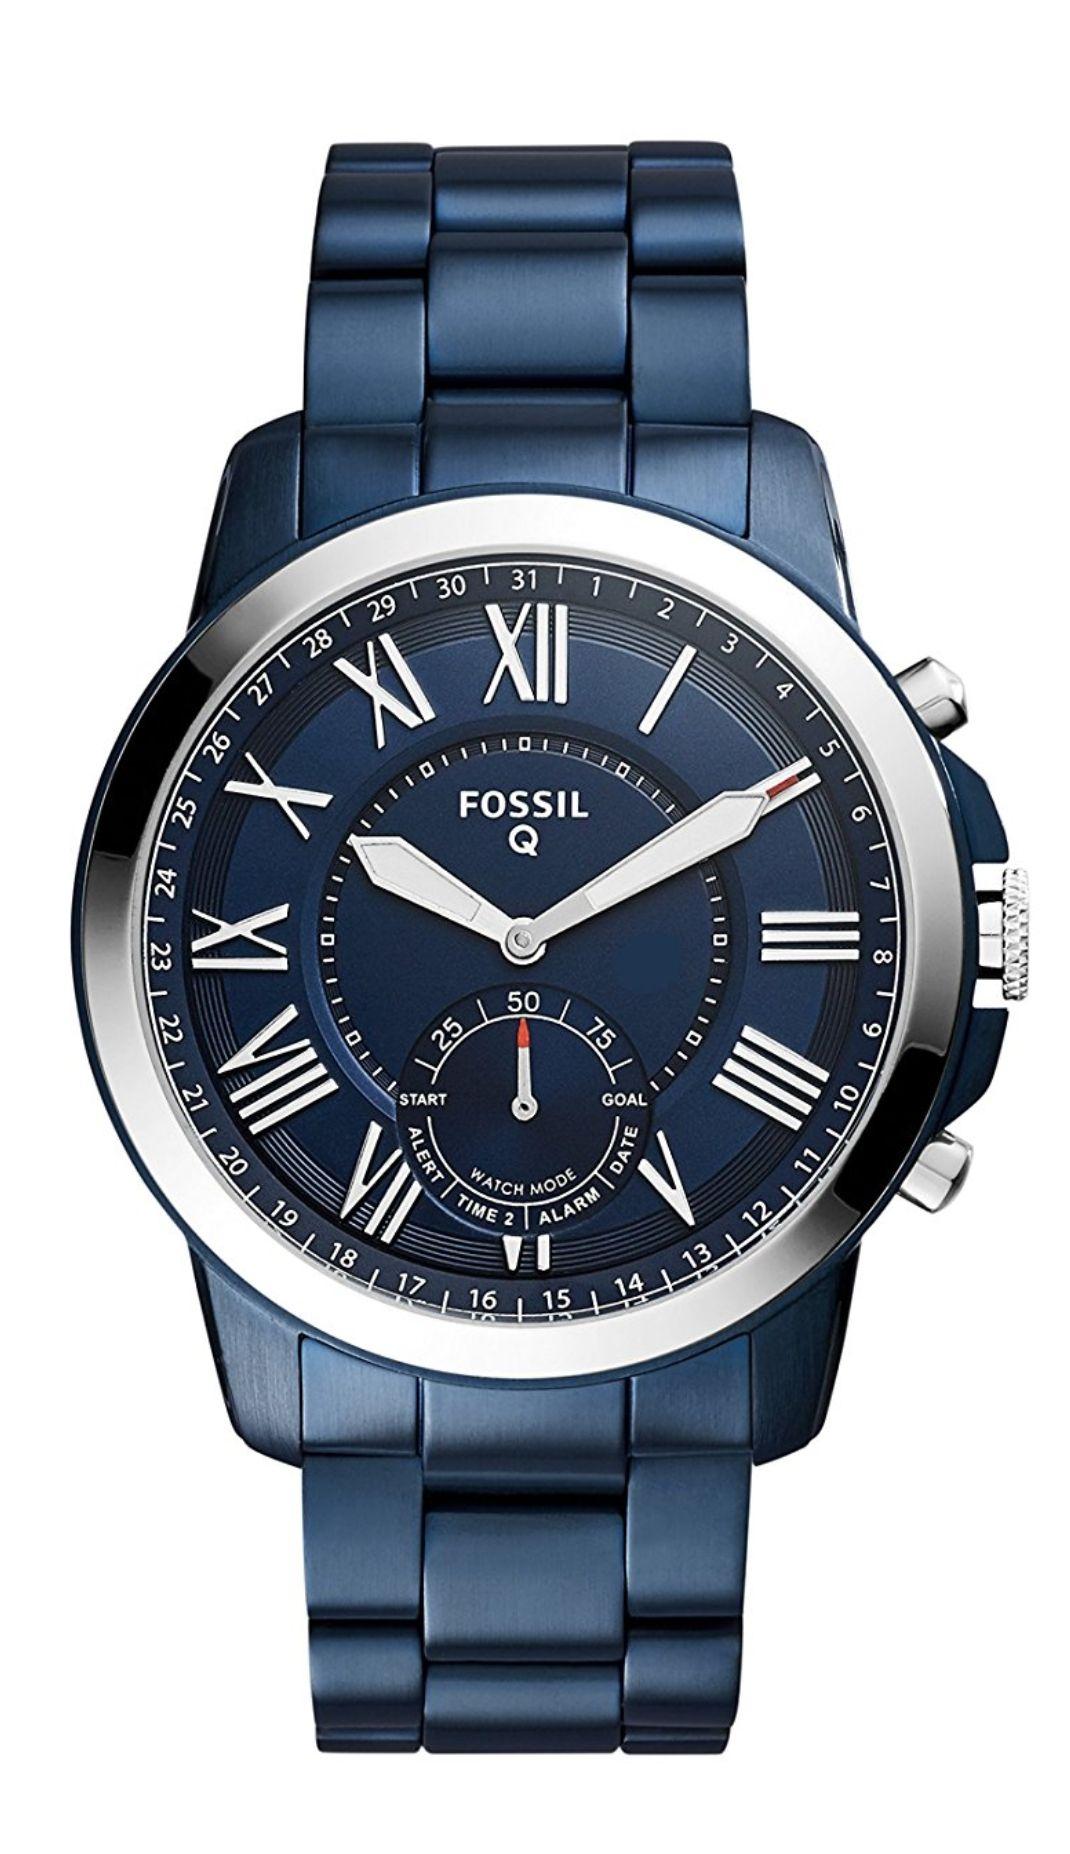 [amazon] Fossil Herren Hybrid Smartwatch Q Grant - Blau (FTW1140)